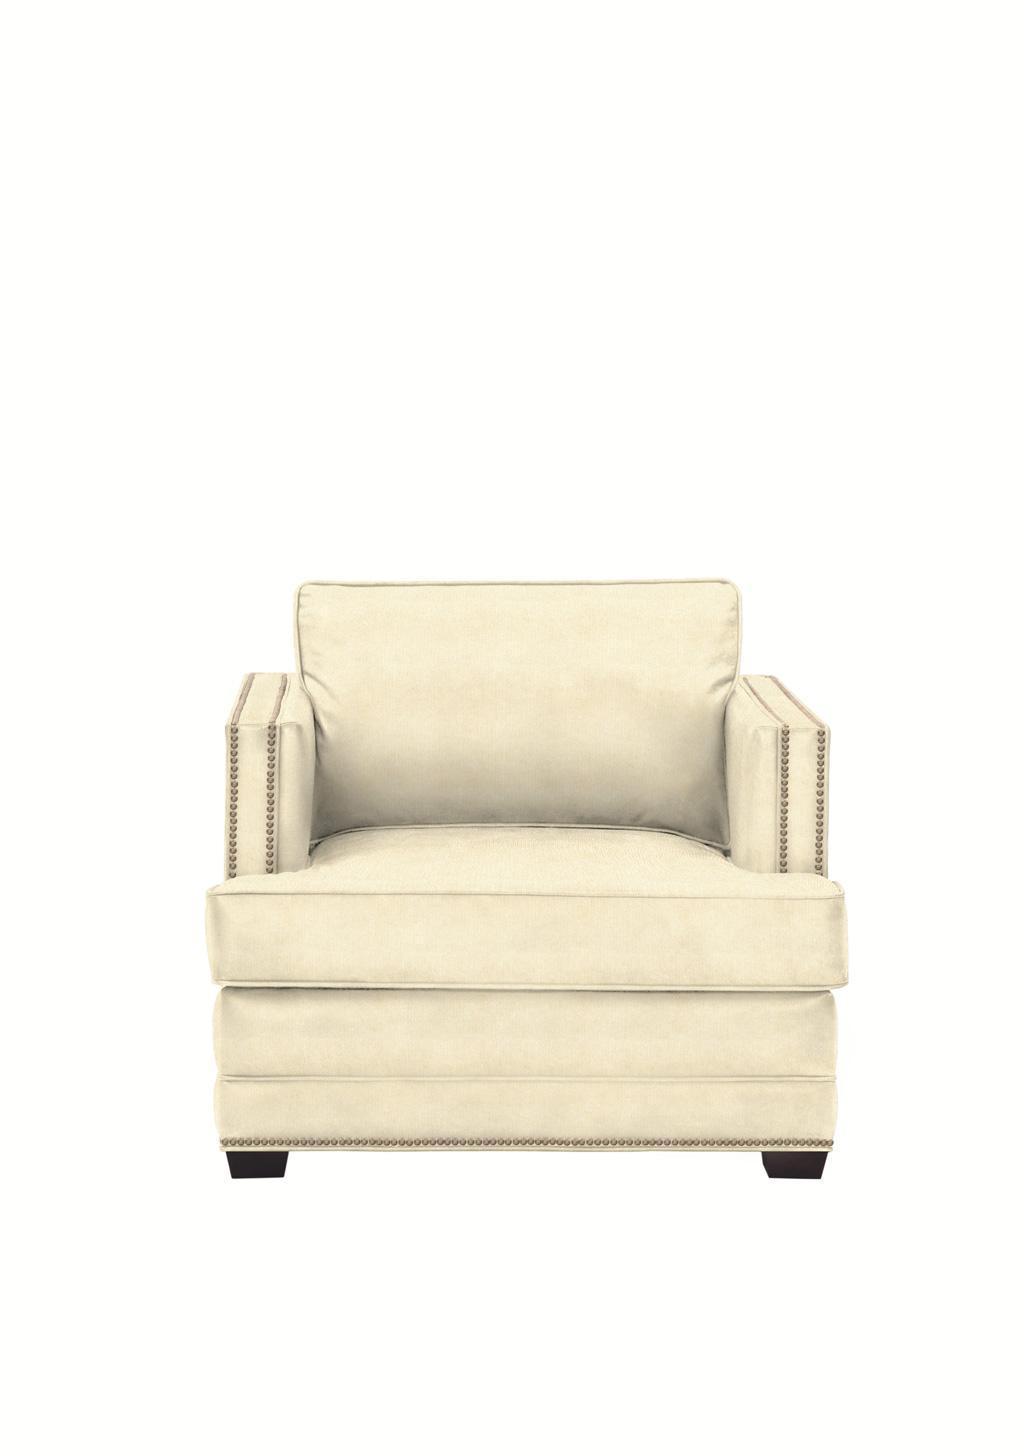 Harbor House DAKOTA单人沙发10186502011018650201